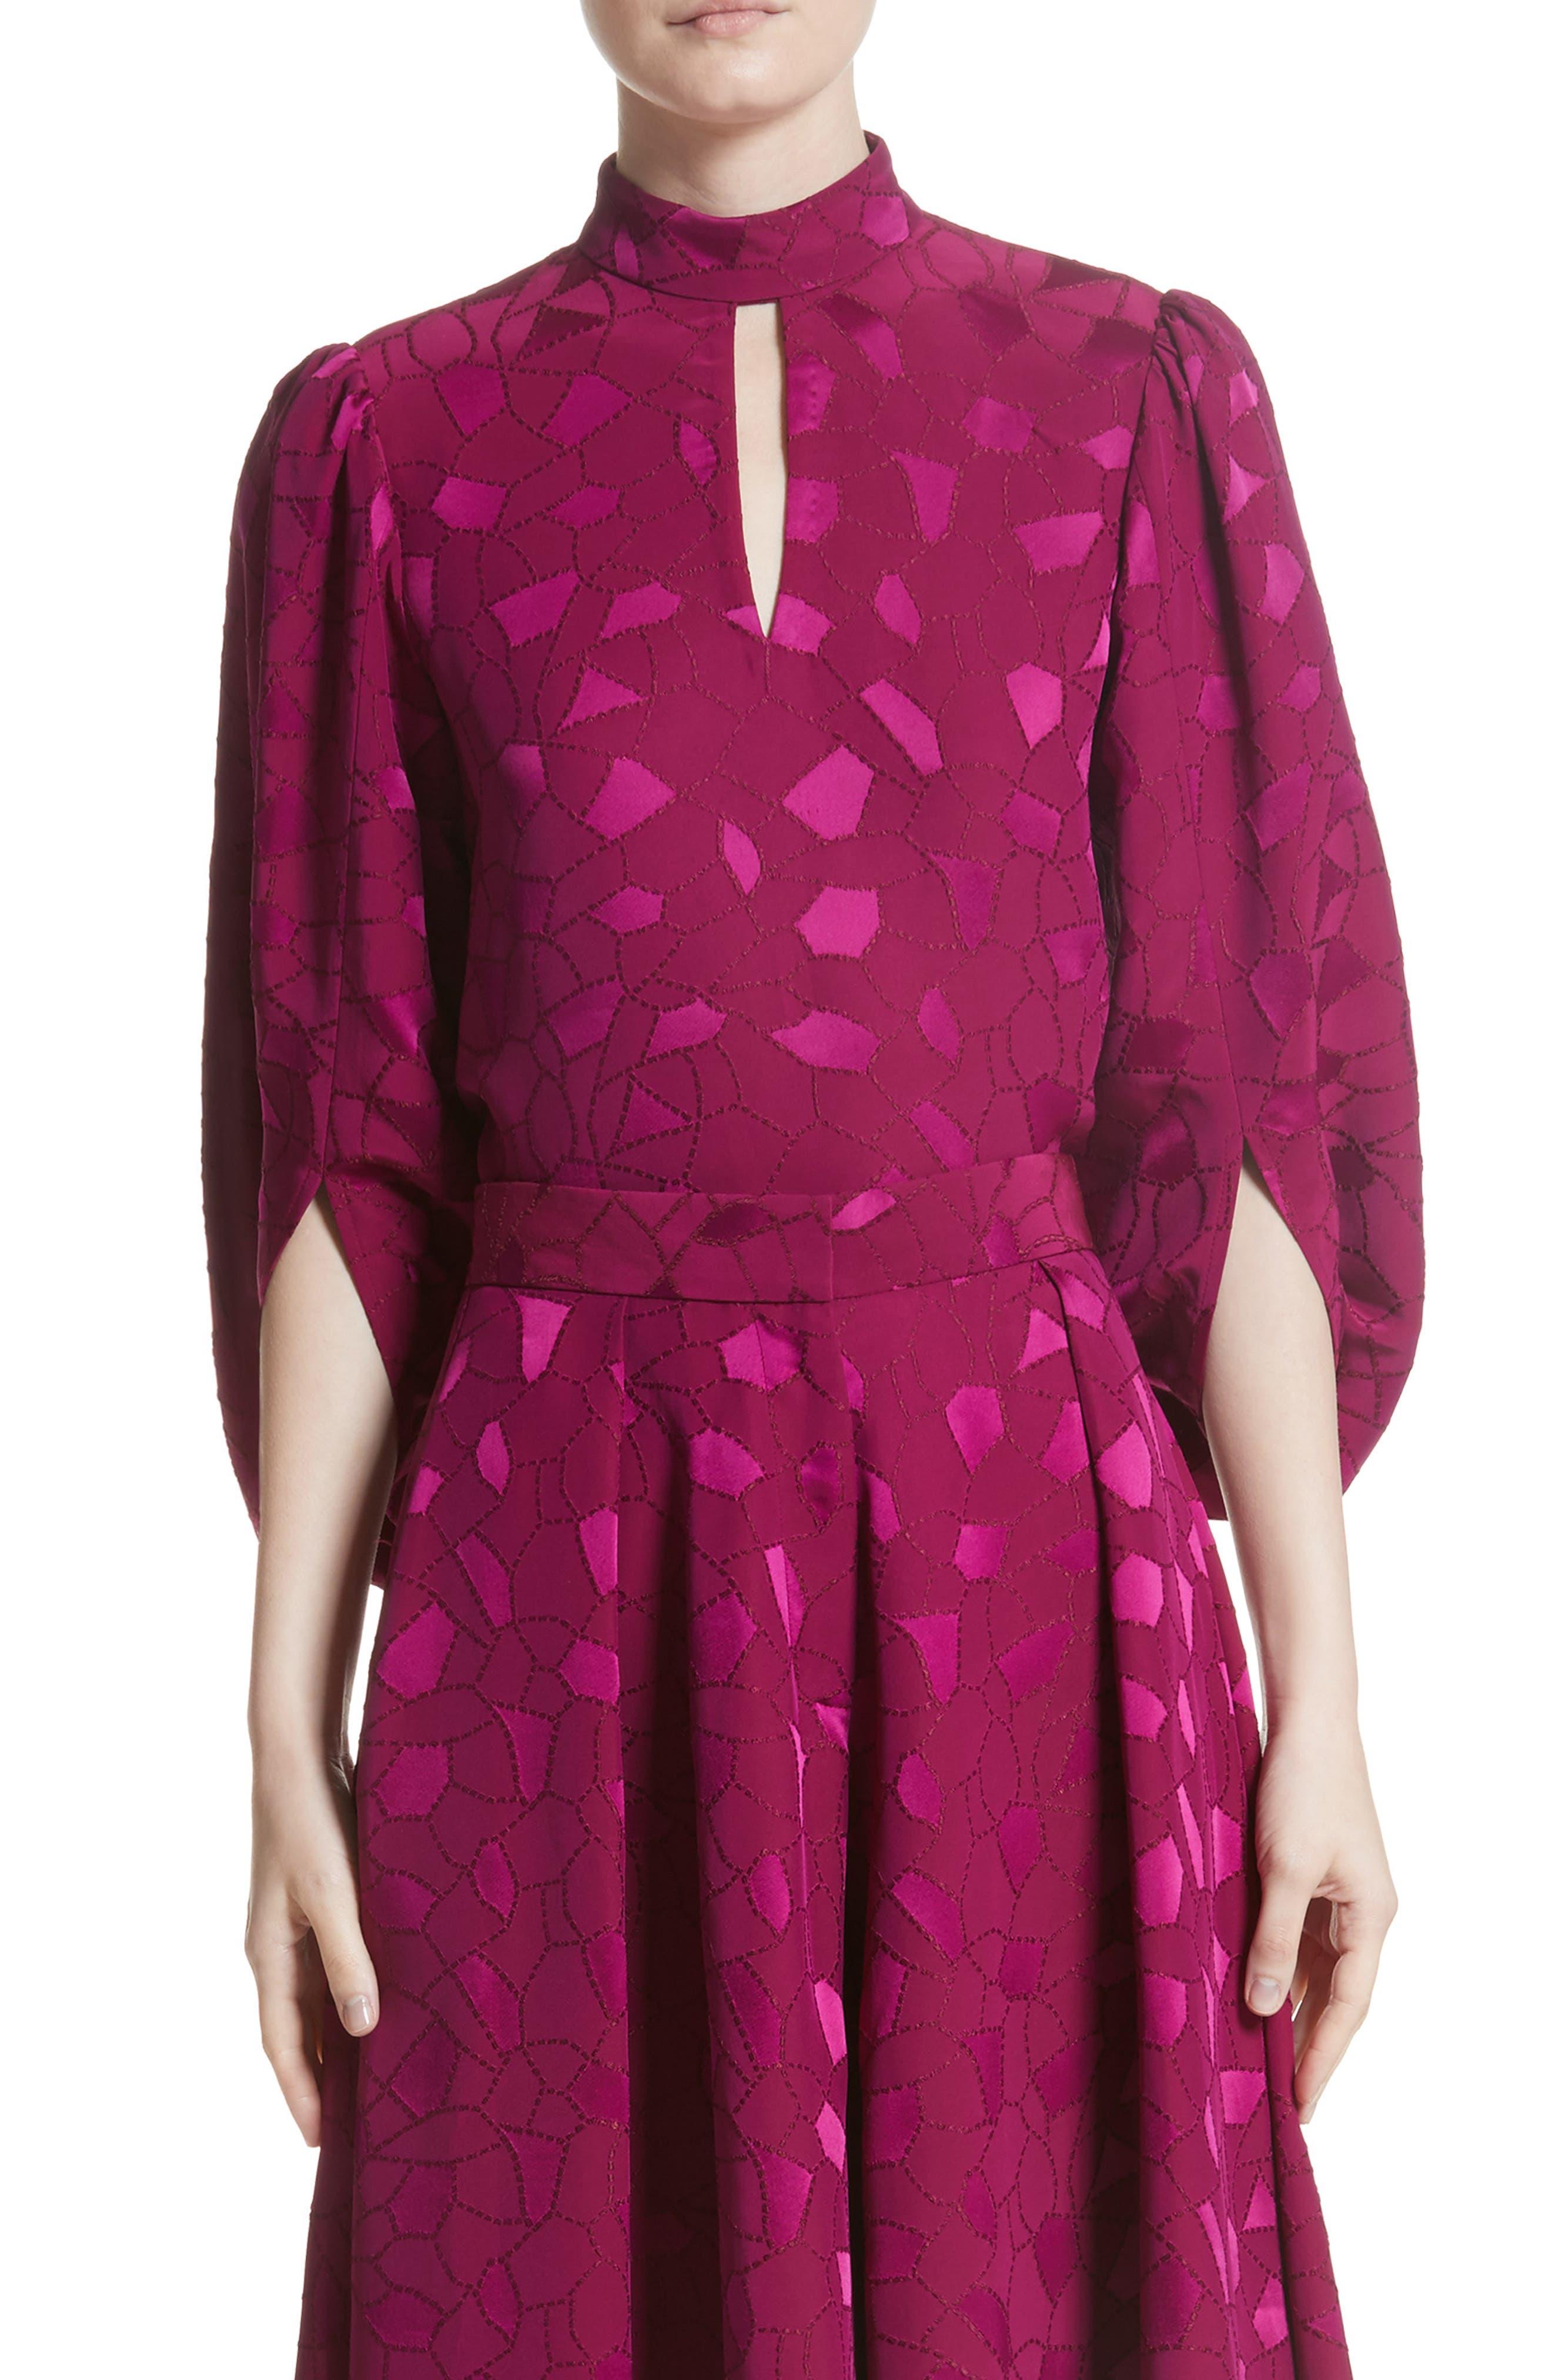 Mosaic Jacquard Puff Sleeve Blouse,                         Main,                         color, Pink